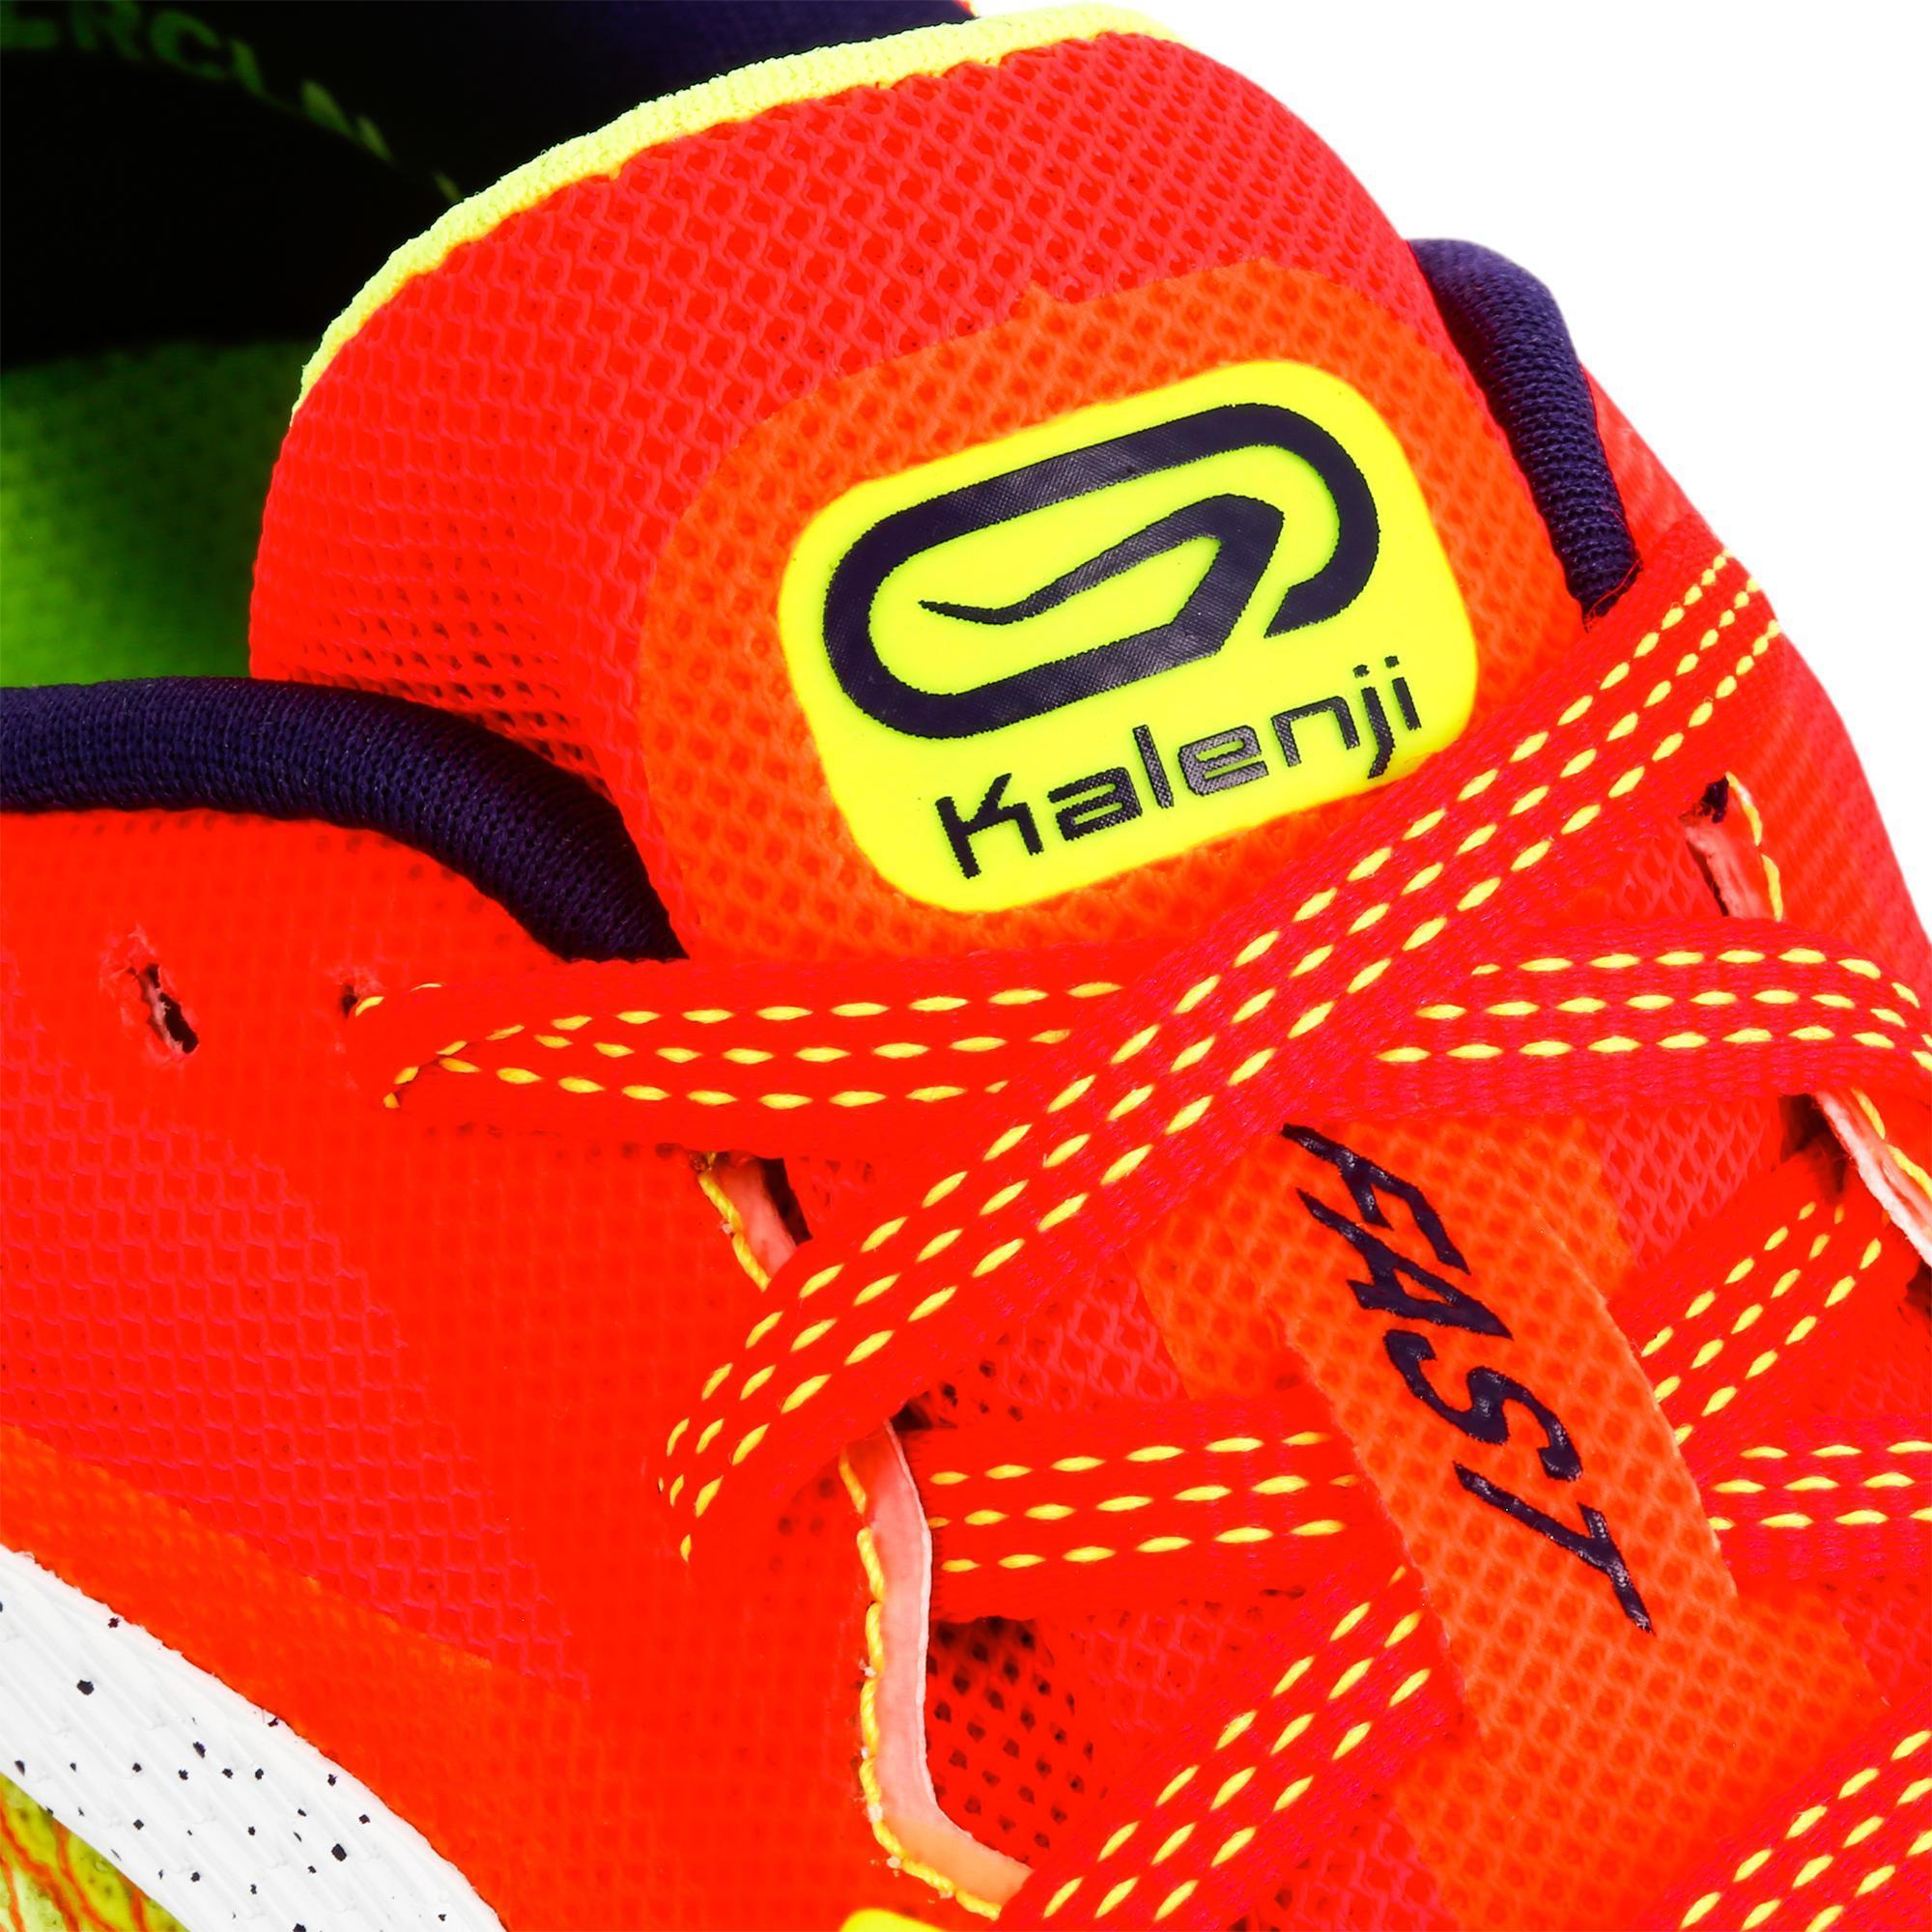 3cdd4bcc502 Kiprun Decathlon Femme Hqsett Fast Kalenji Running Chaussures Corail  66Bwq1rx